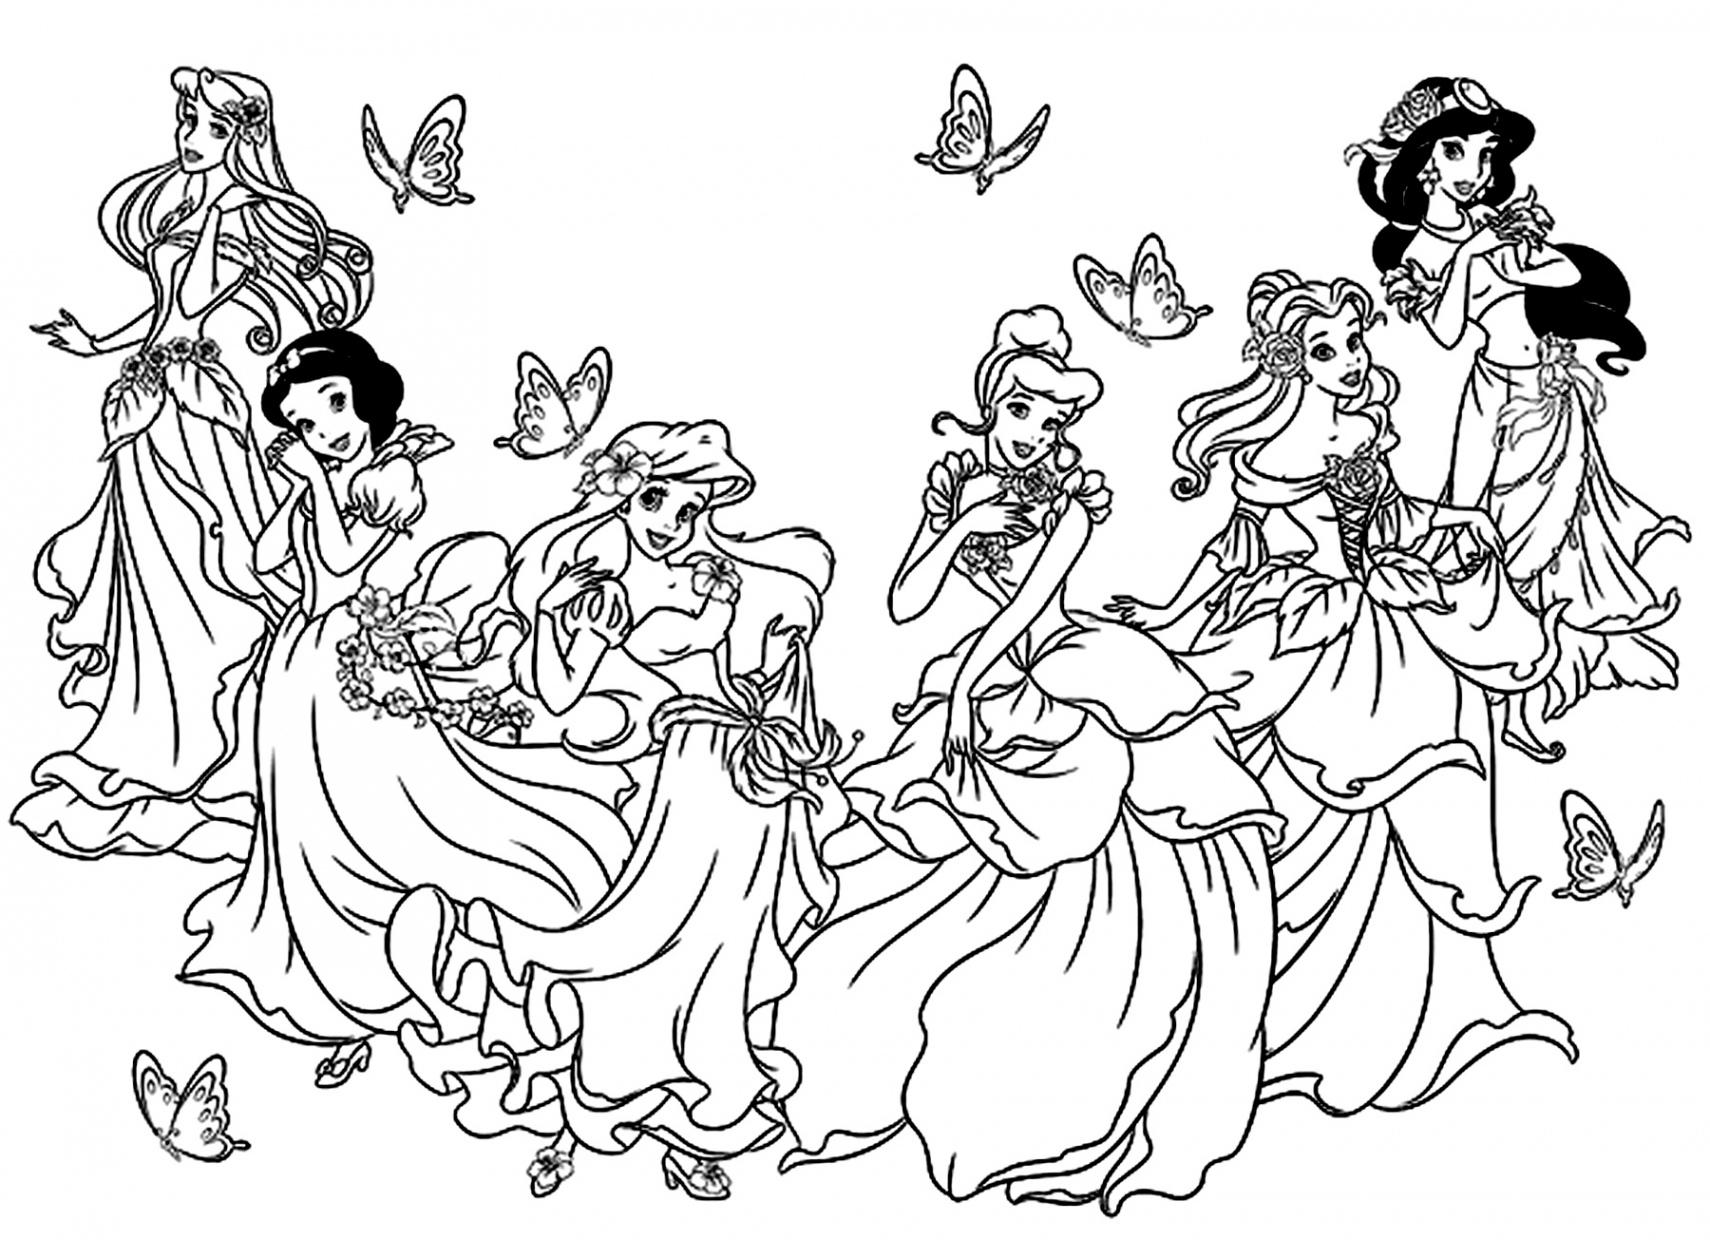 Coloriages A Imprimer Walt Disney Numero 3a2c55de